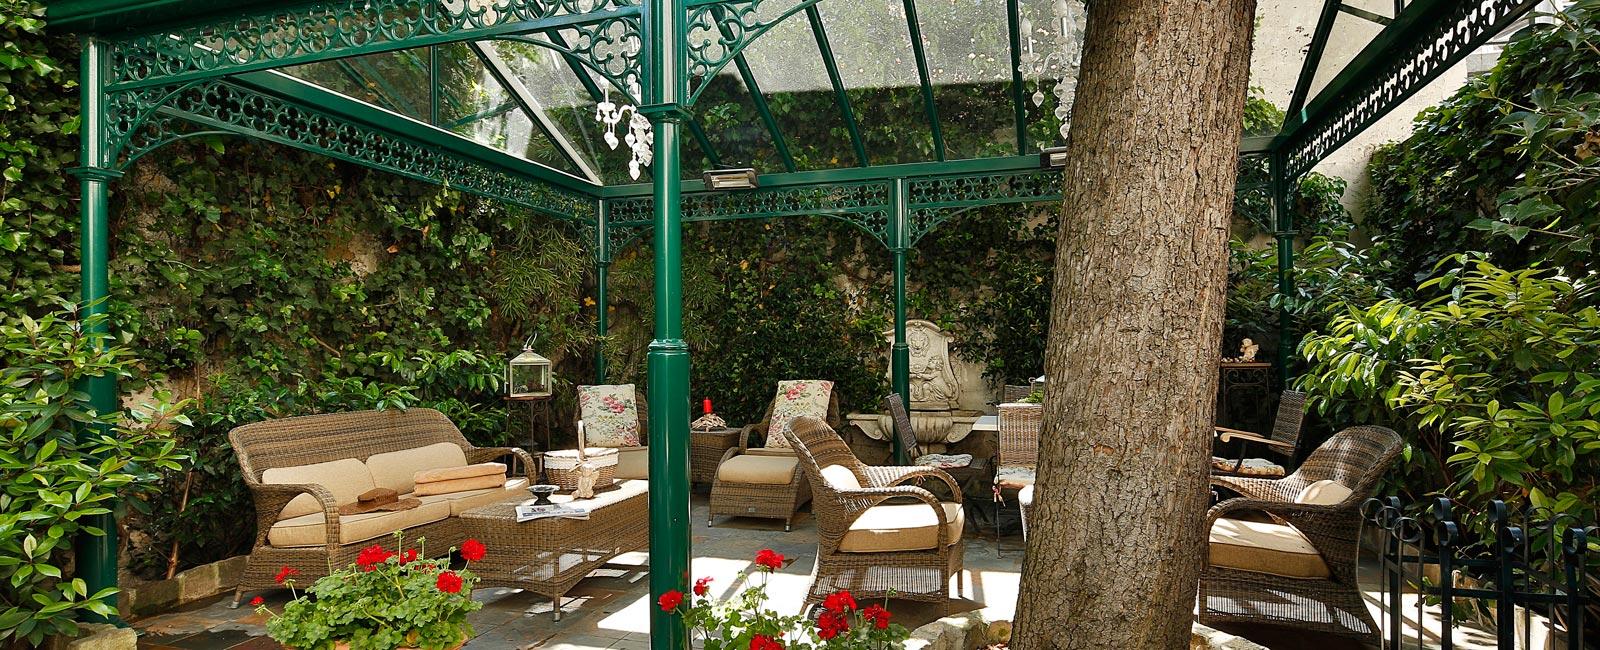 Salon De The Jardin Hotel Des Marronniers Paris